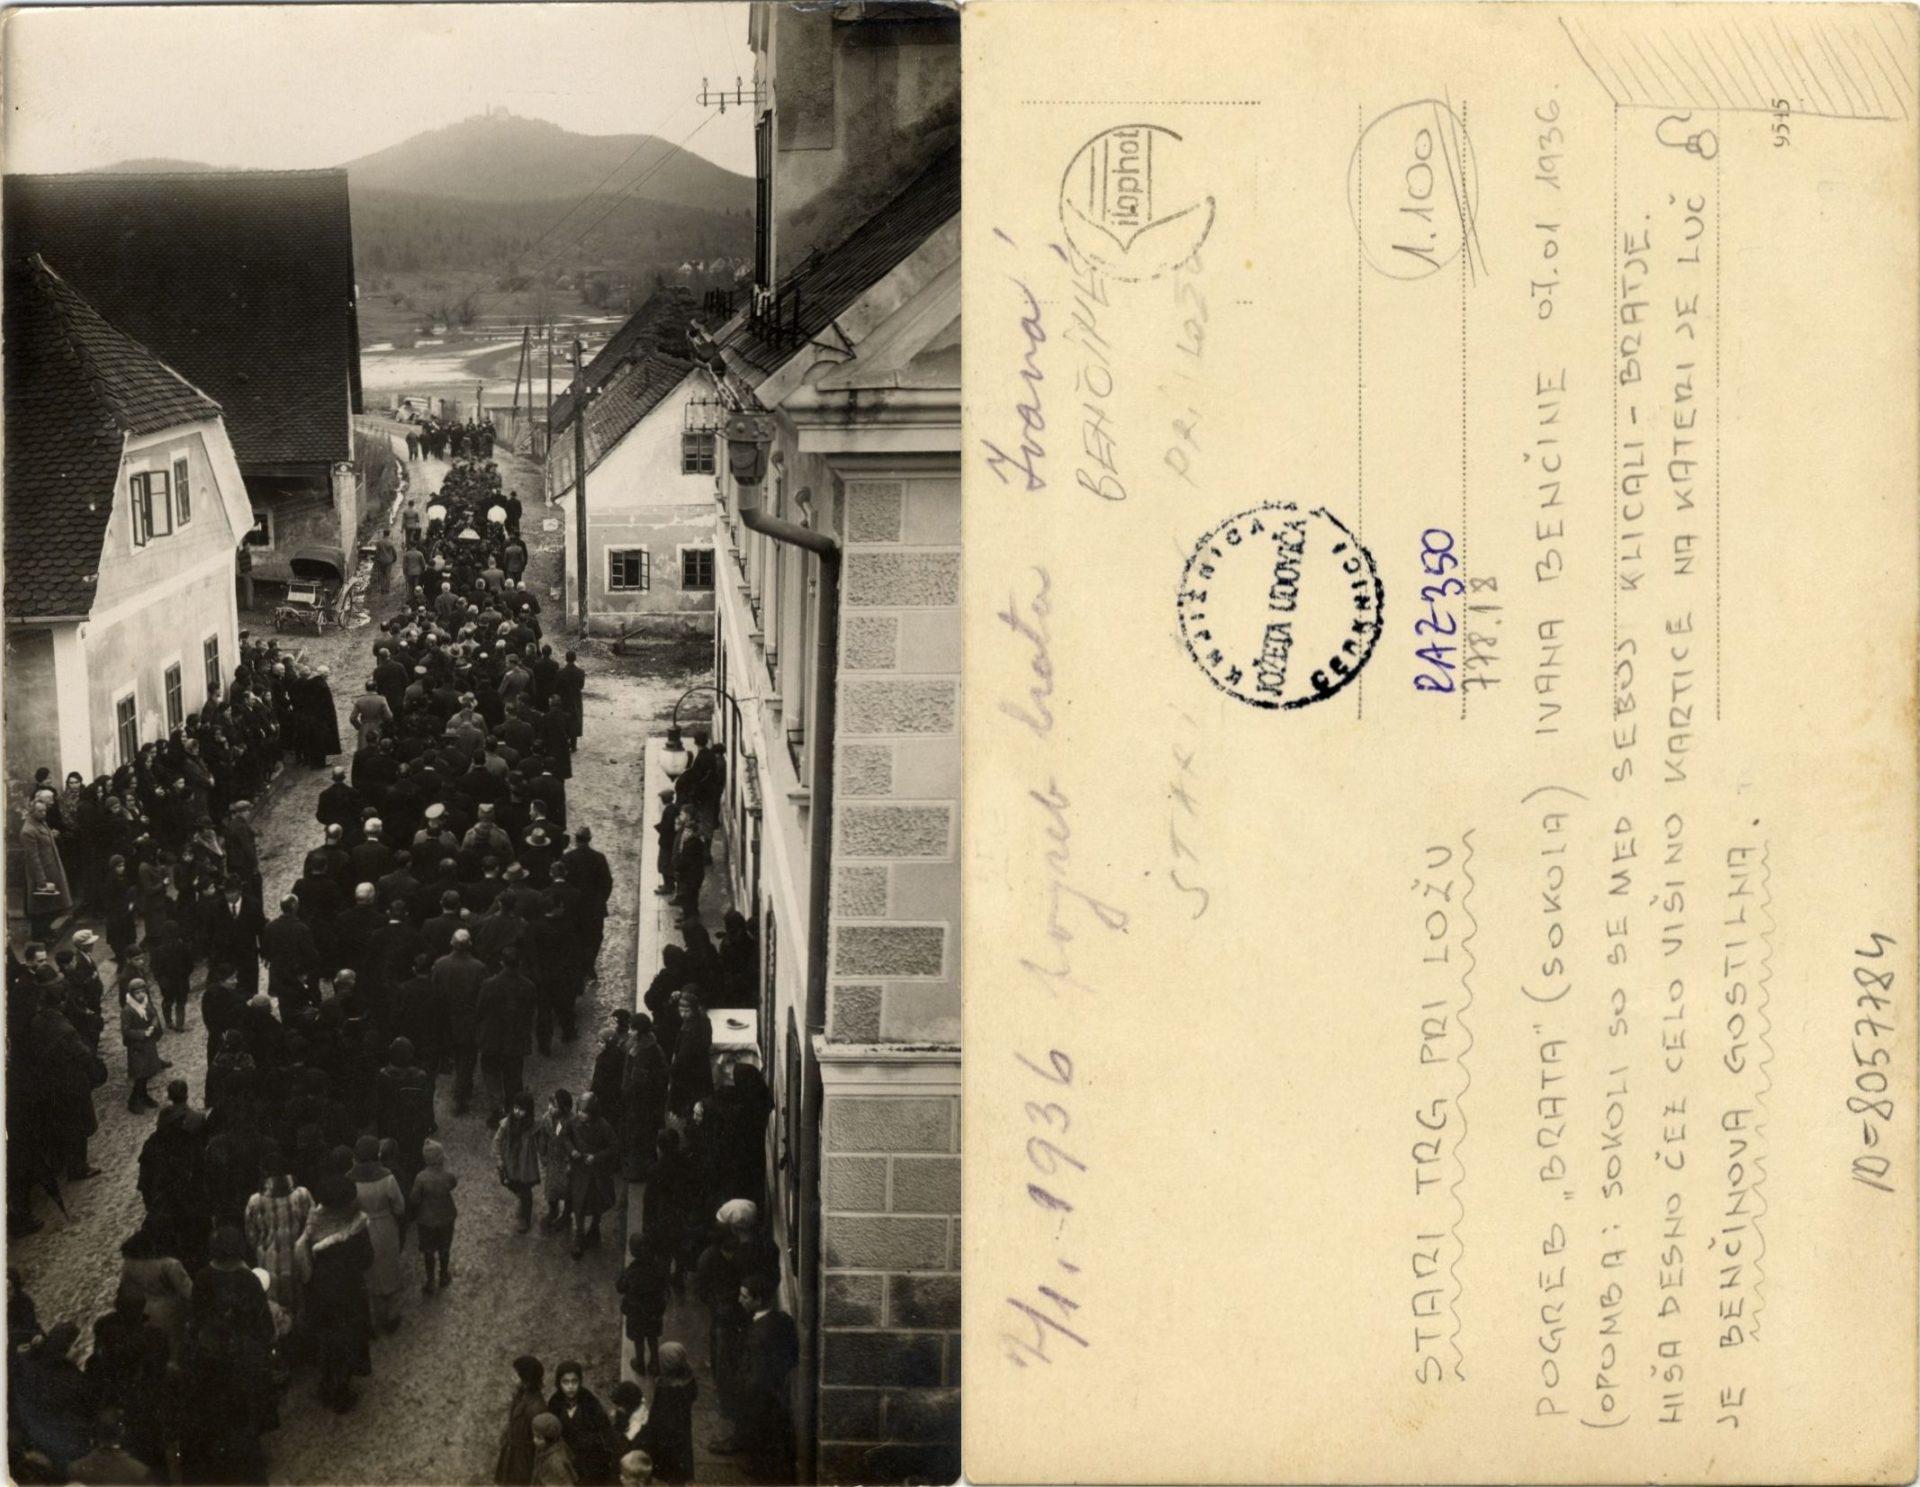 zlimano 171 - Stari trg